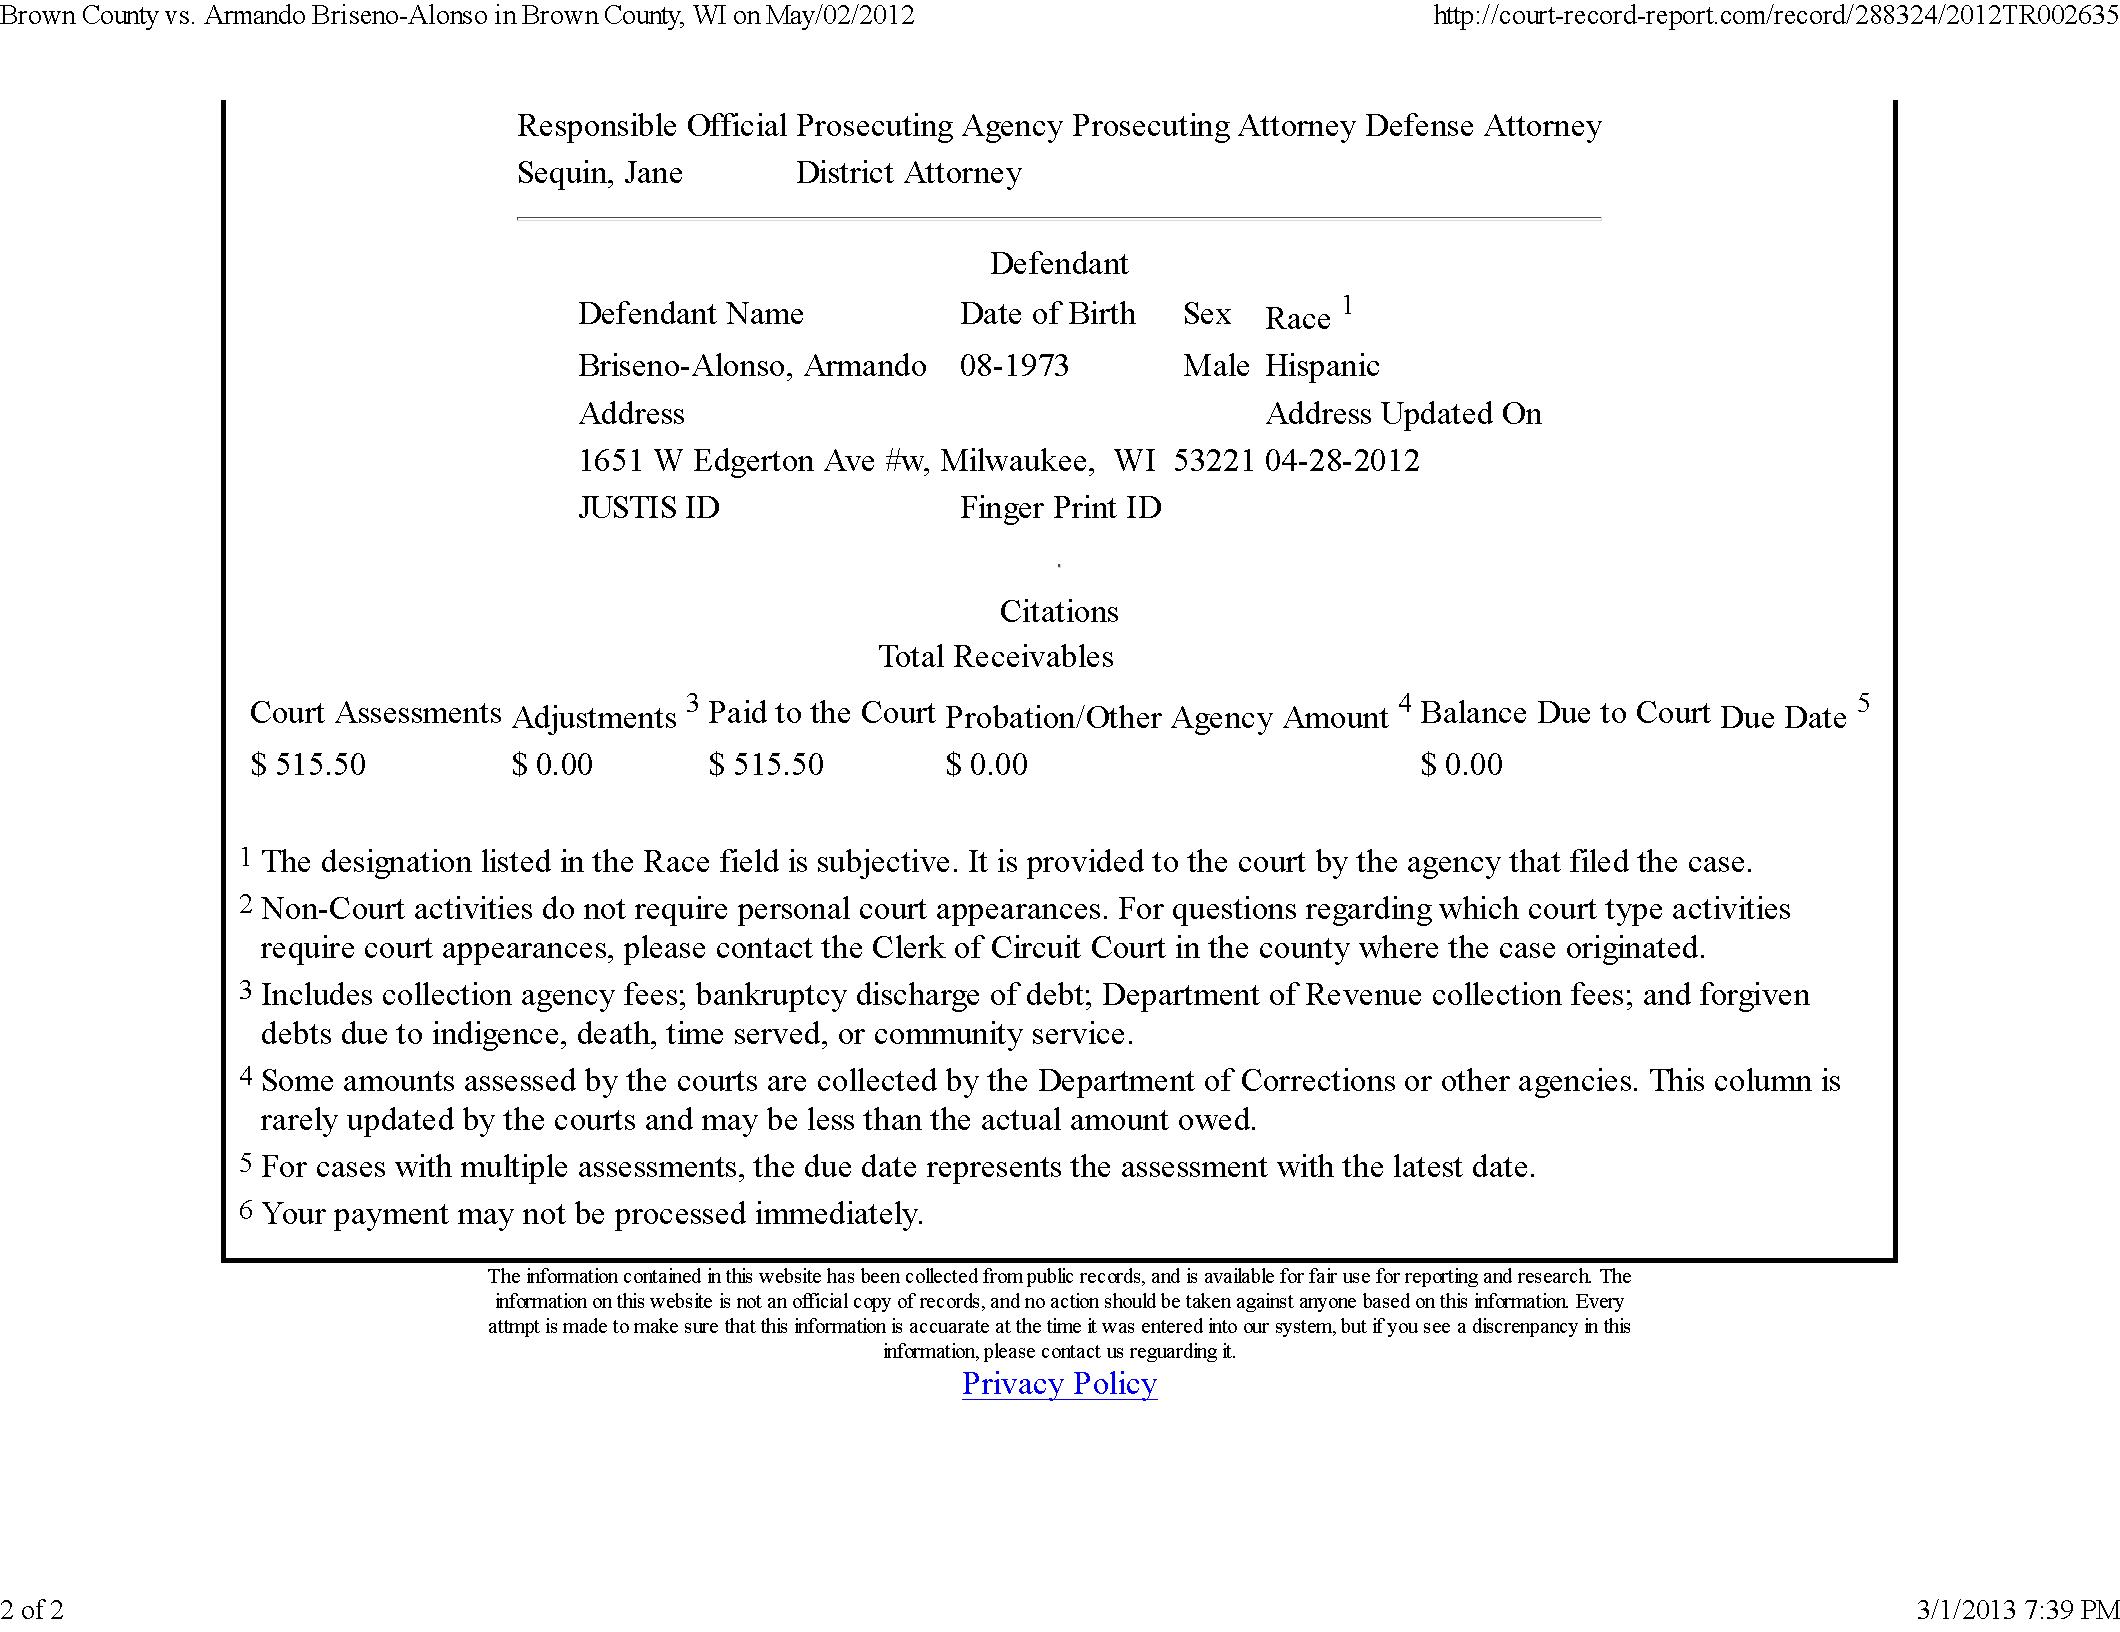 Copy of Briseno-Alonso Armando speeding ticket2.png